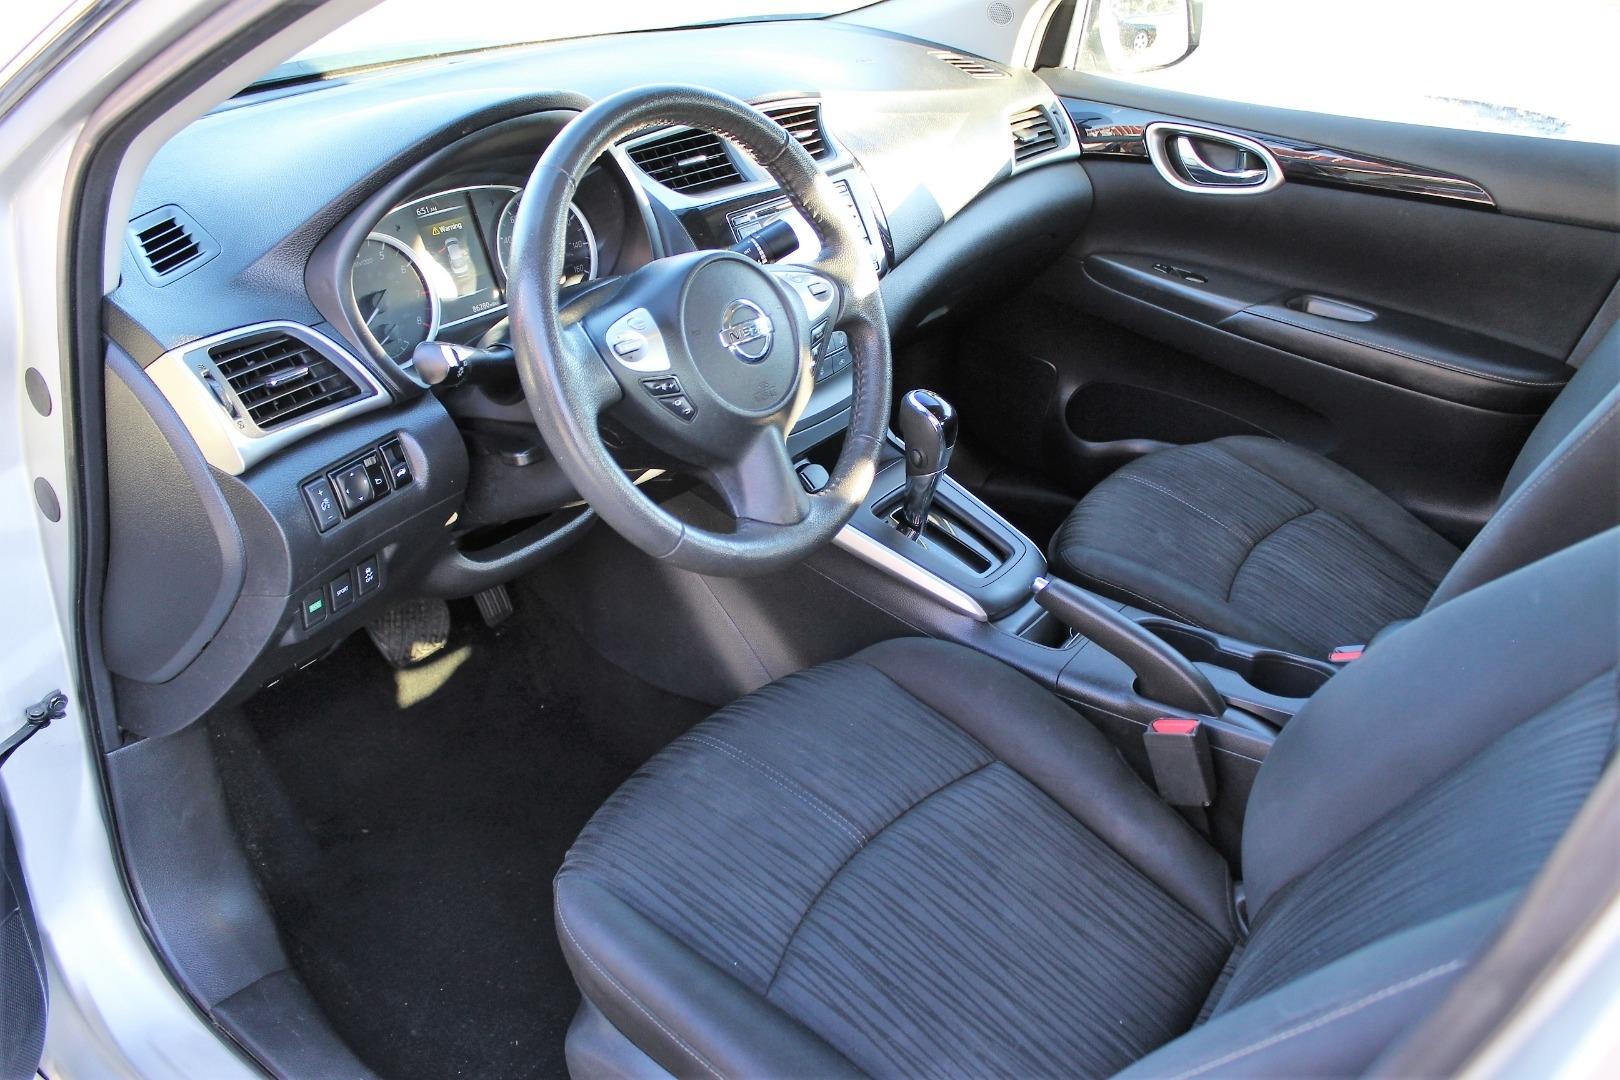 2017 Nissan Sentra Sr Cvt Larrys Used Autos Dealership In Wilmington